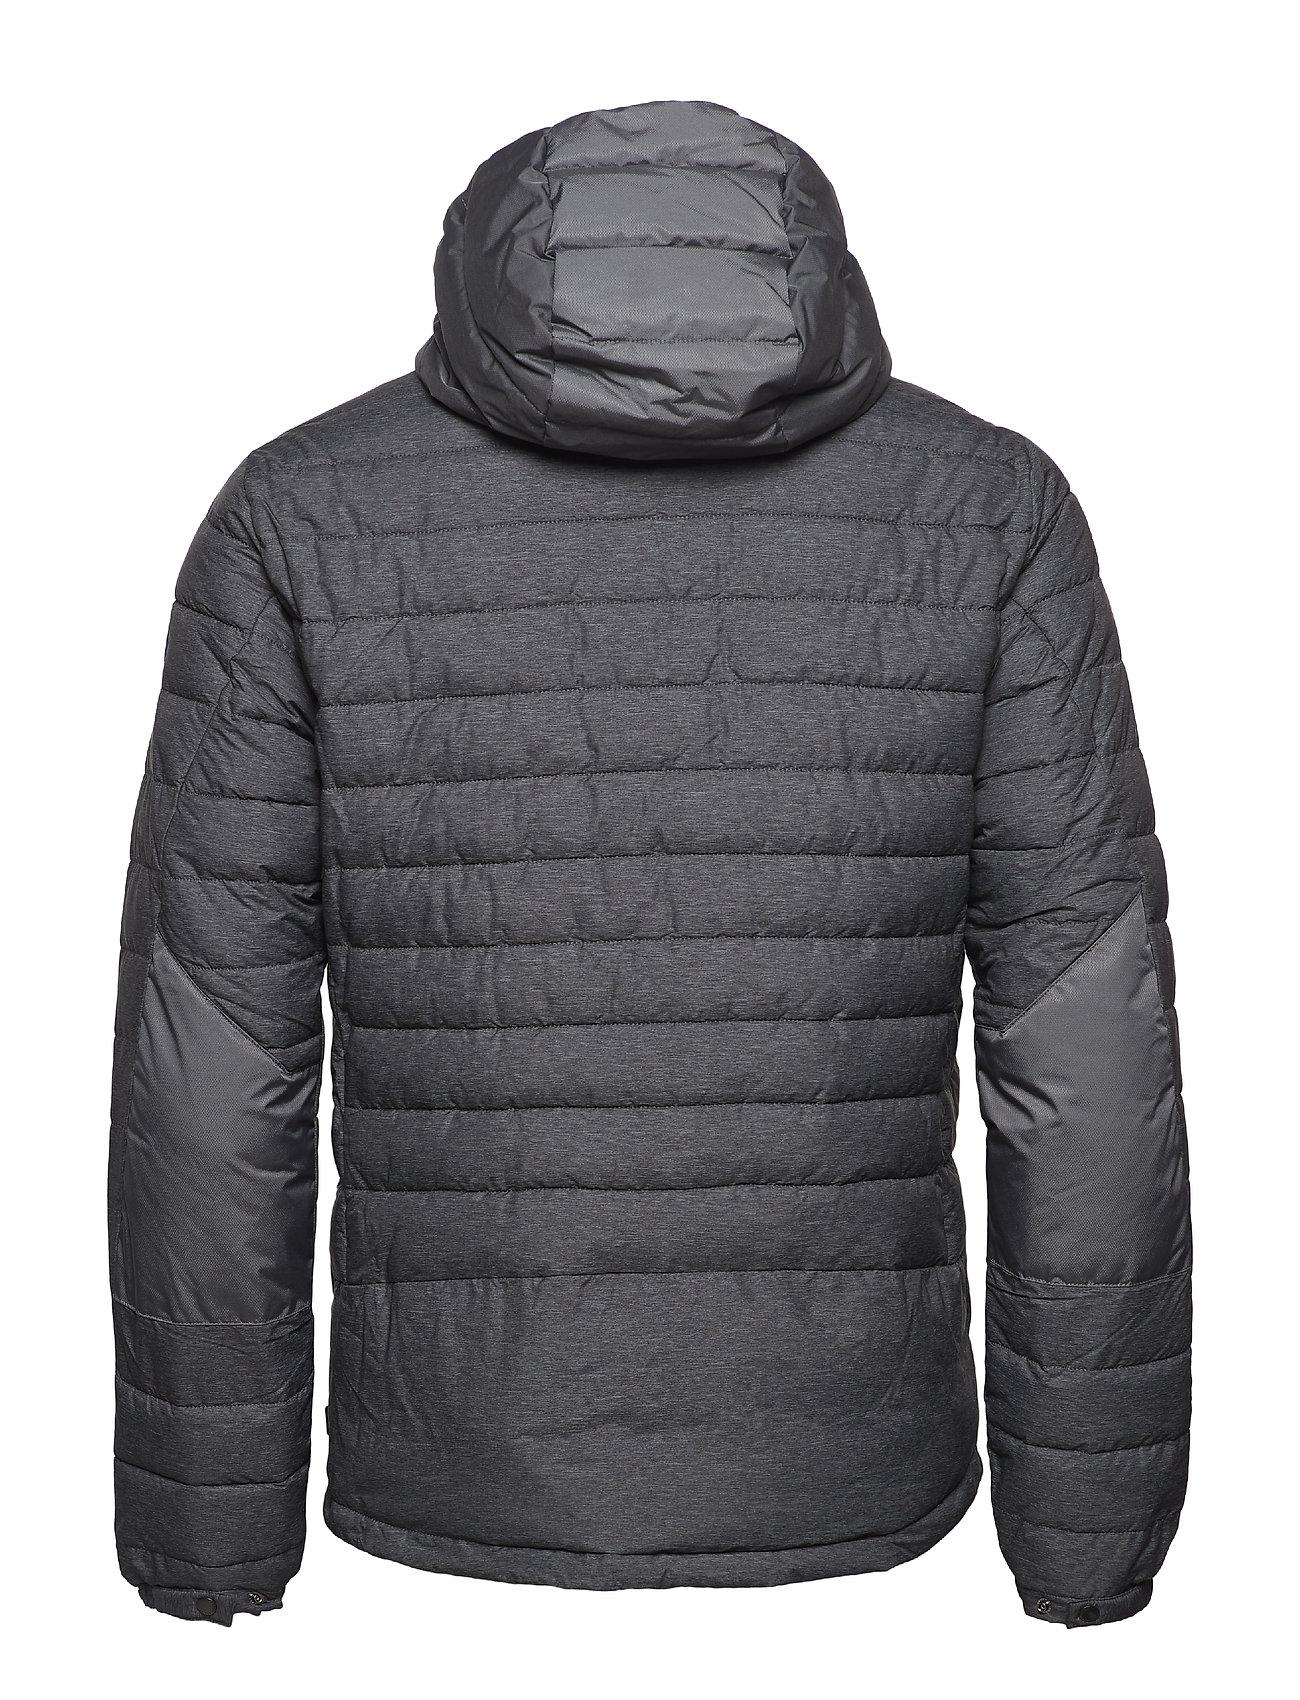 Nylon Jacket Hoodblack MelangeScotchamp; Soda Short Detachable With Quilted SULpqzVMG